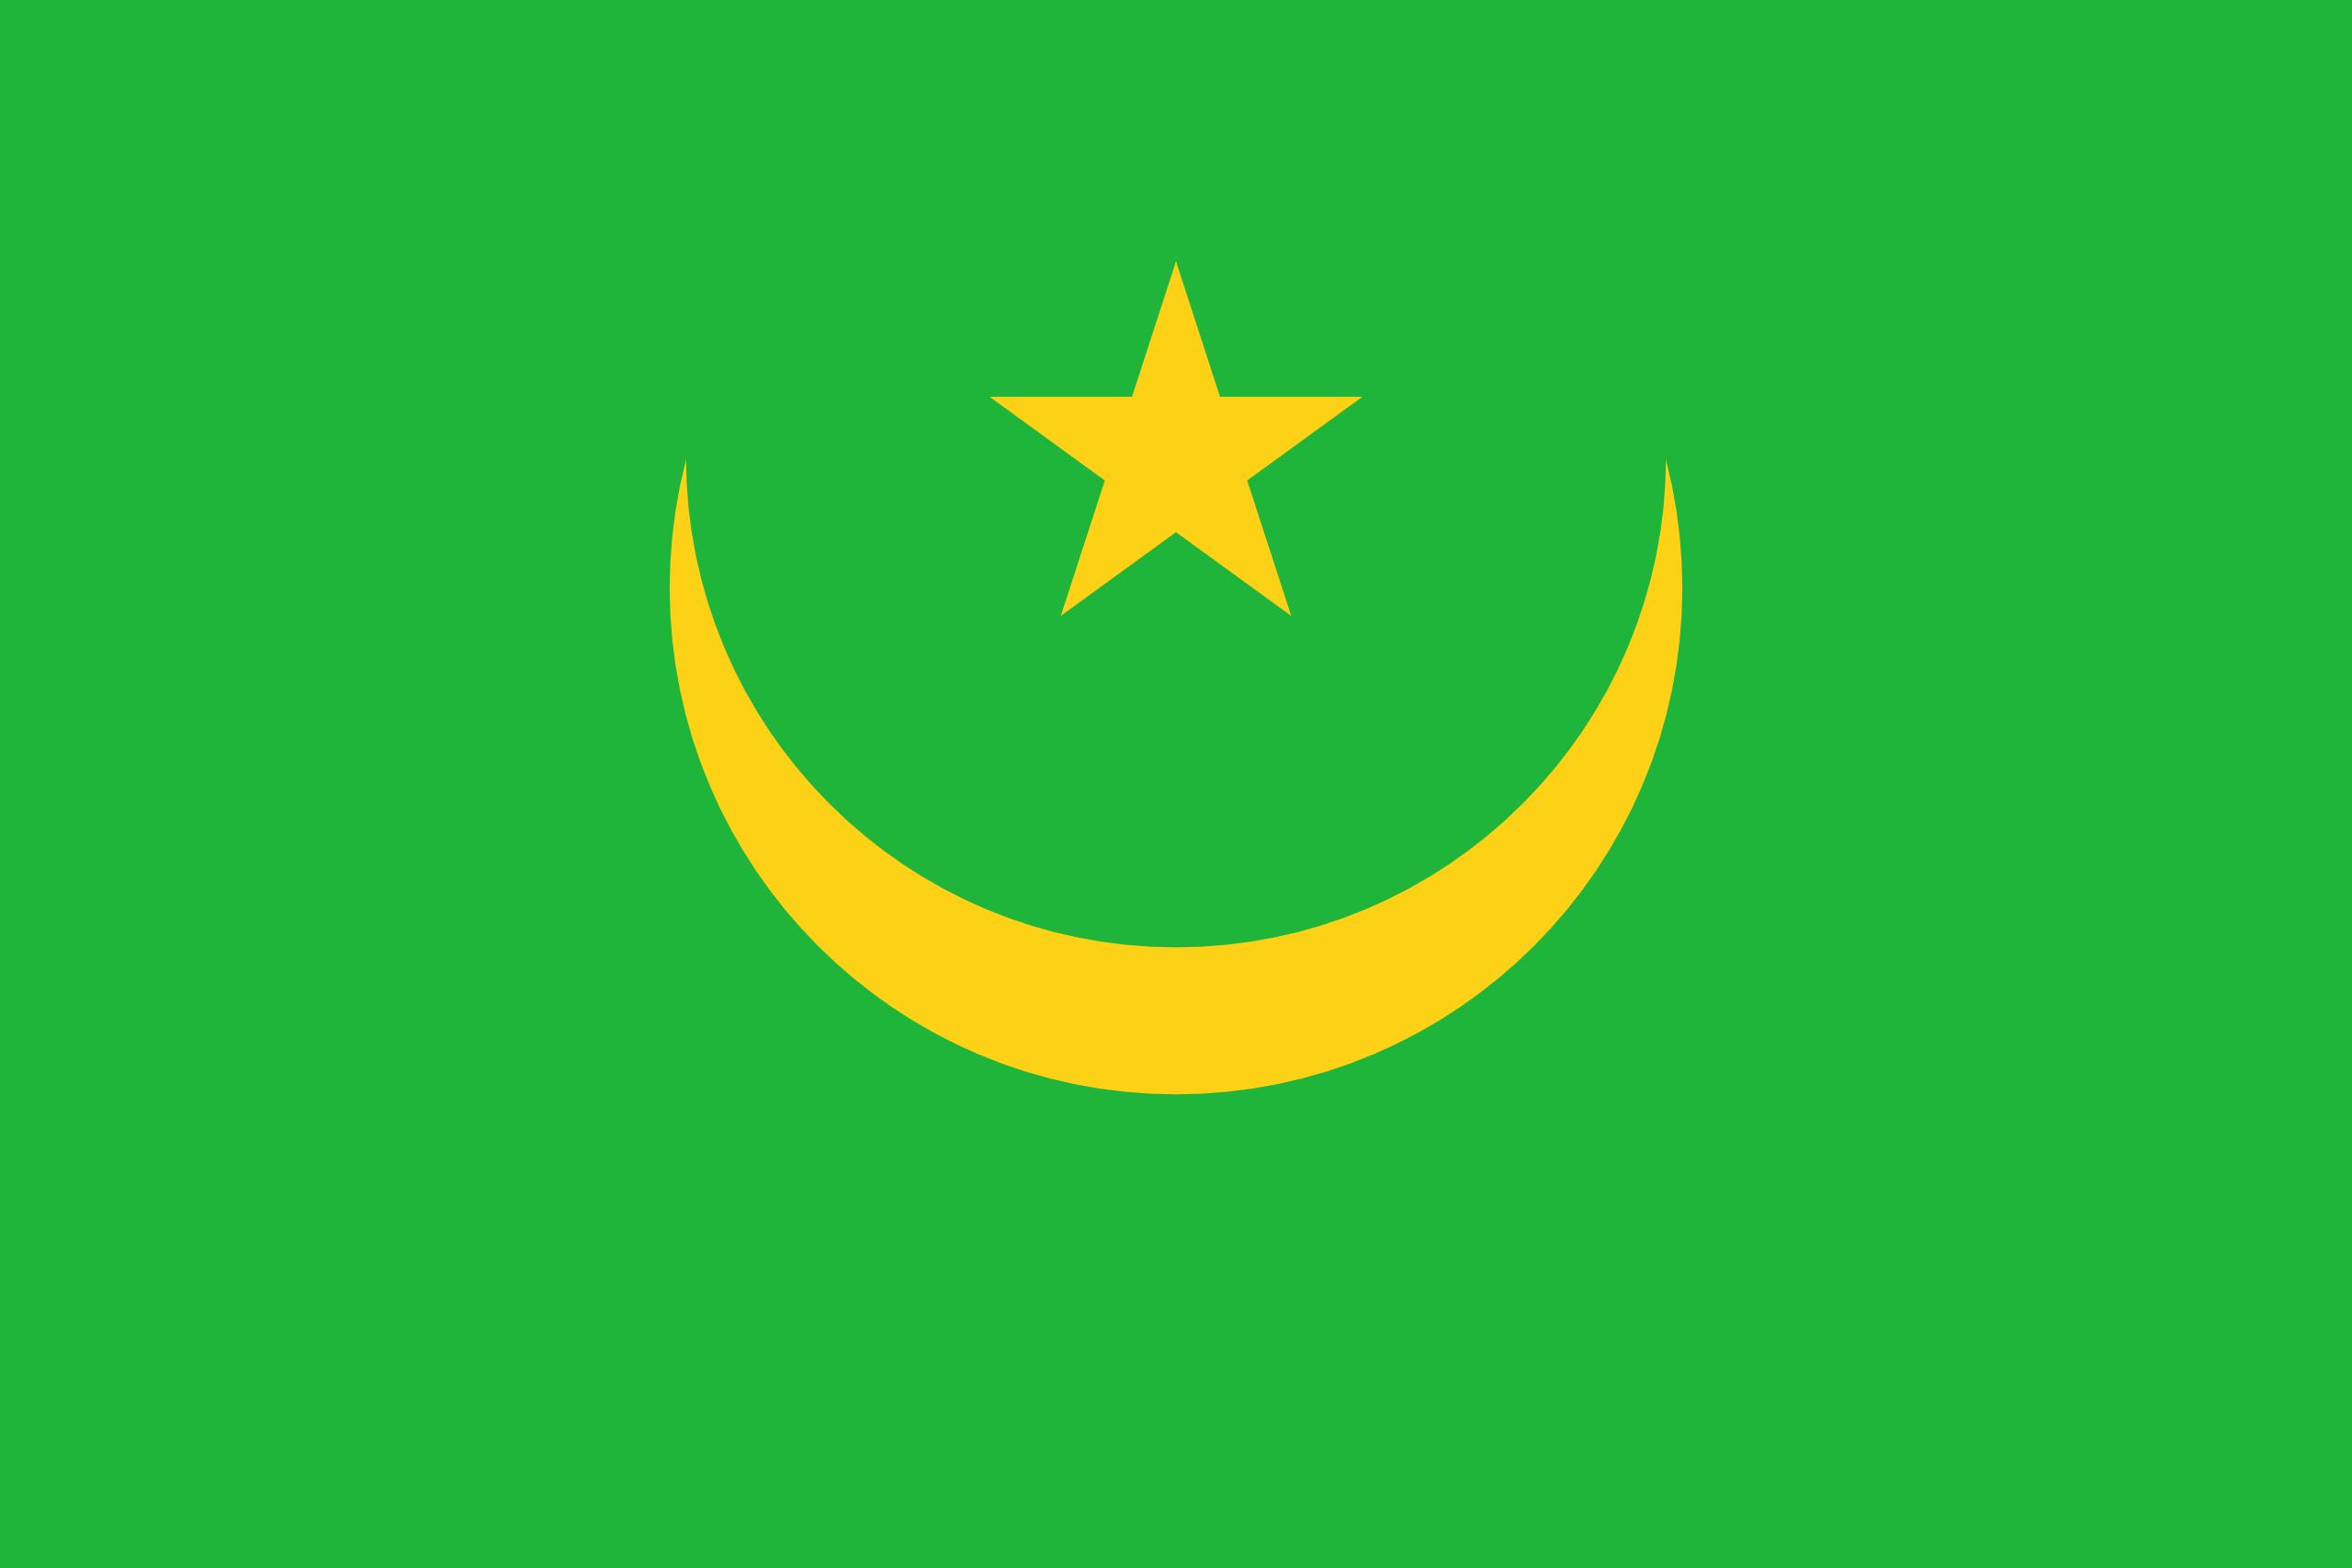 Mauritanie, pays, emblème, logo, symbole - Fonds d'écran HD - Professor-falken.com